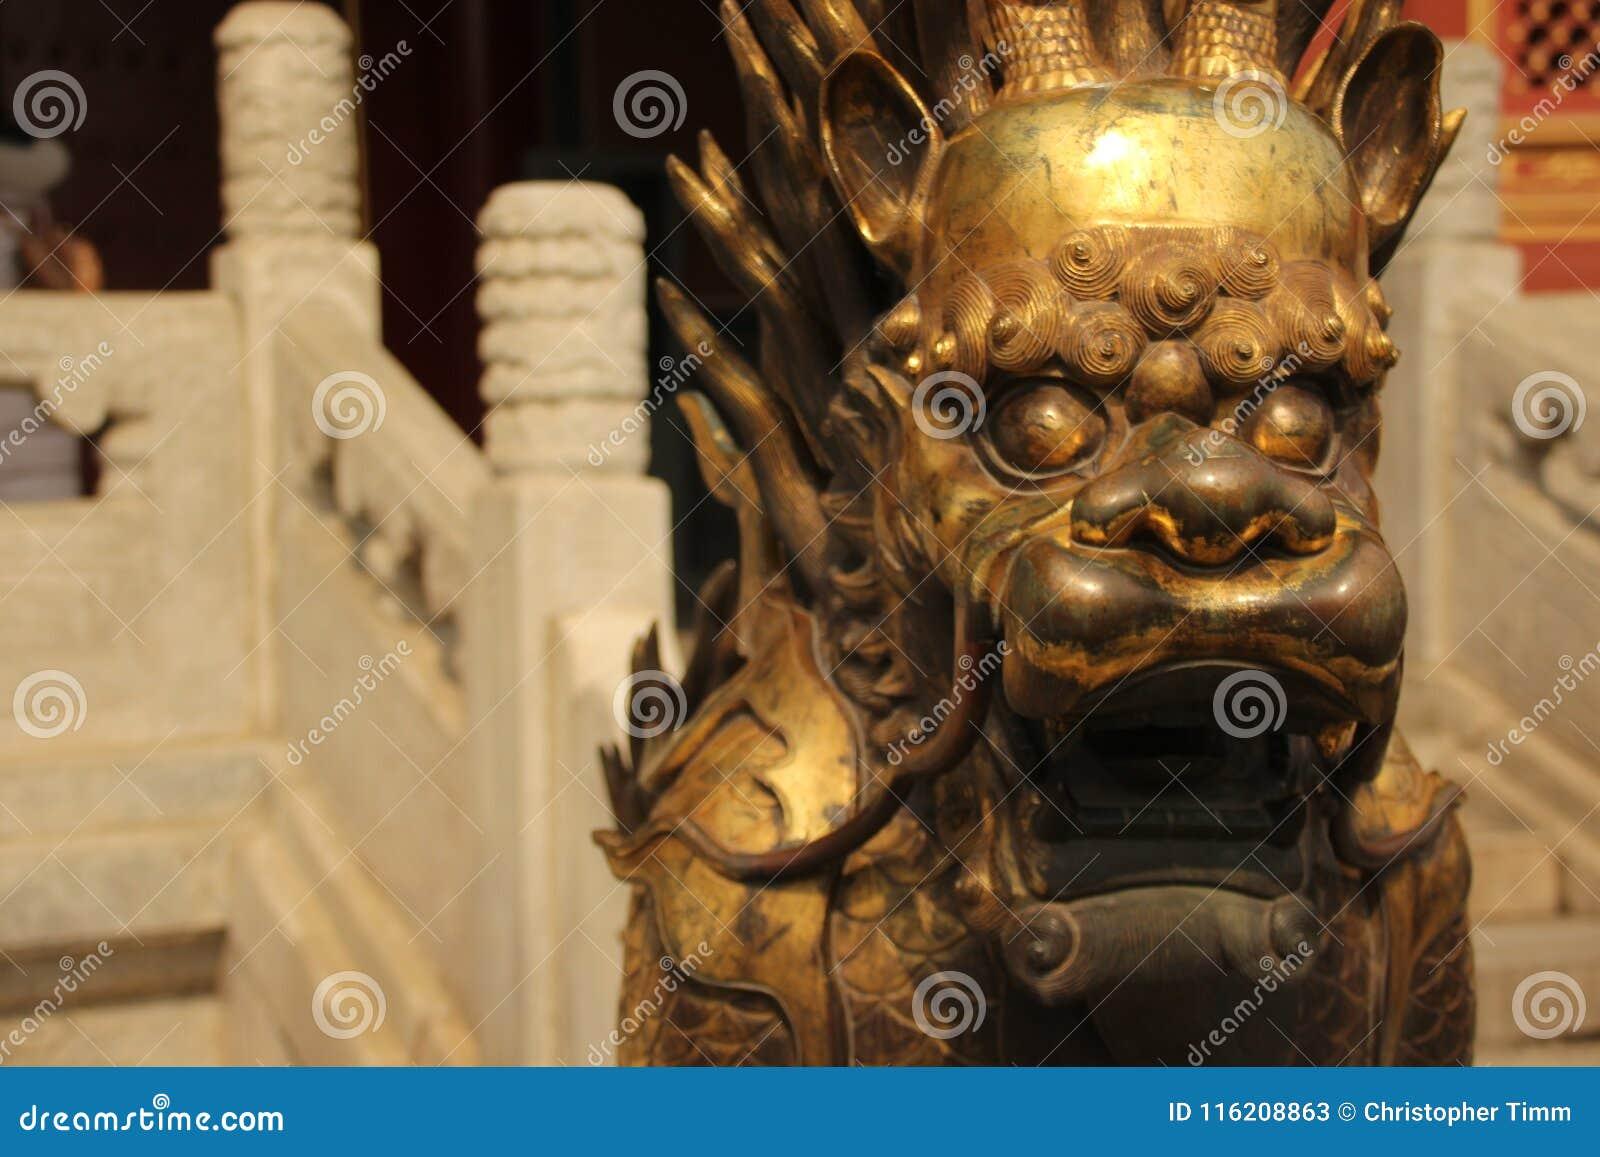 Close-up of a Gilded lion statue, Forbidden City, Beijing